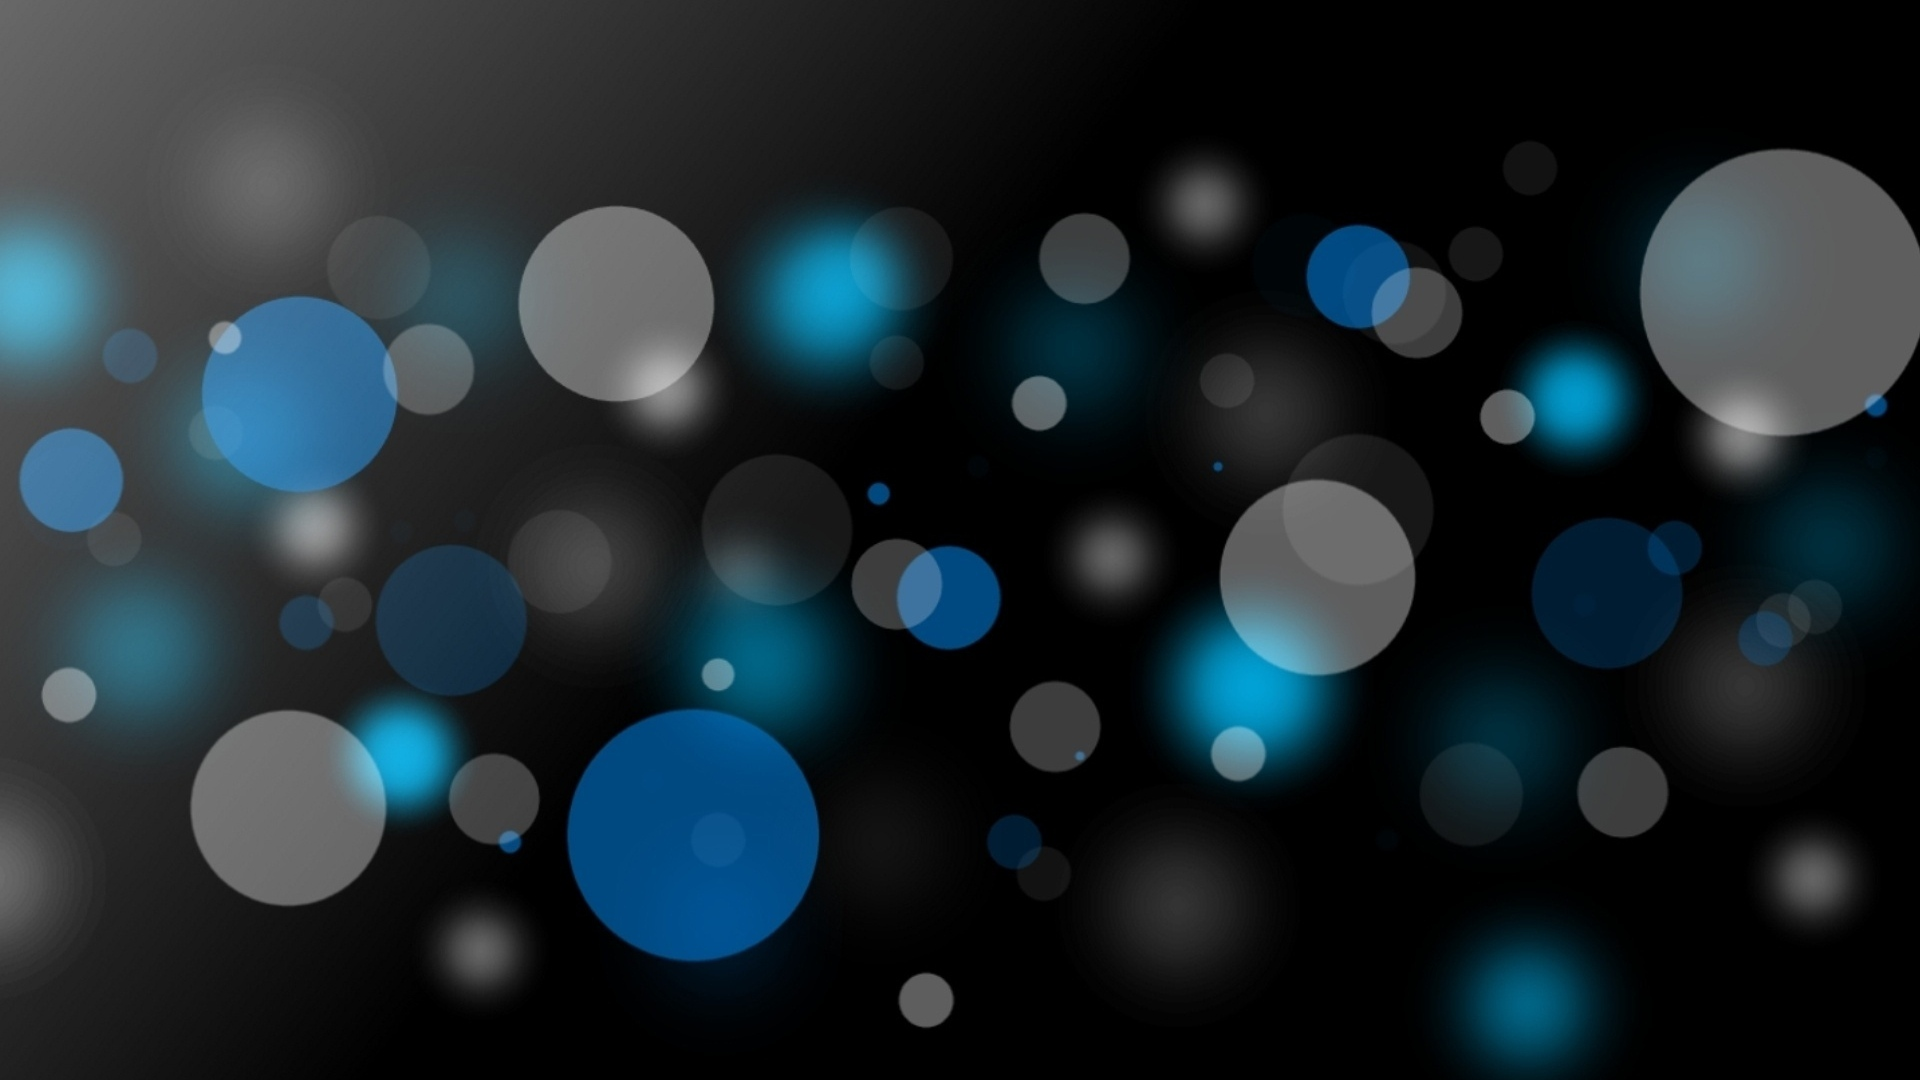 Download Wallpaper 1920x1080 Dark Circle Gray Black Full Hd 1080p Hd Background